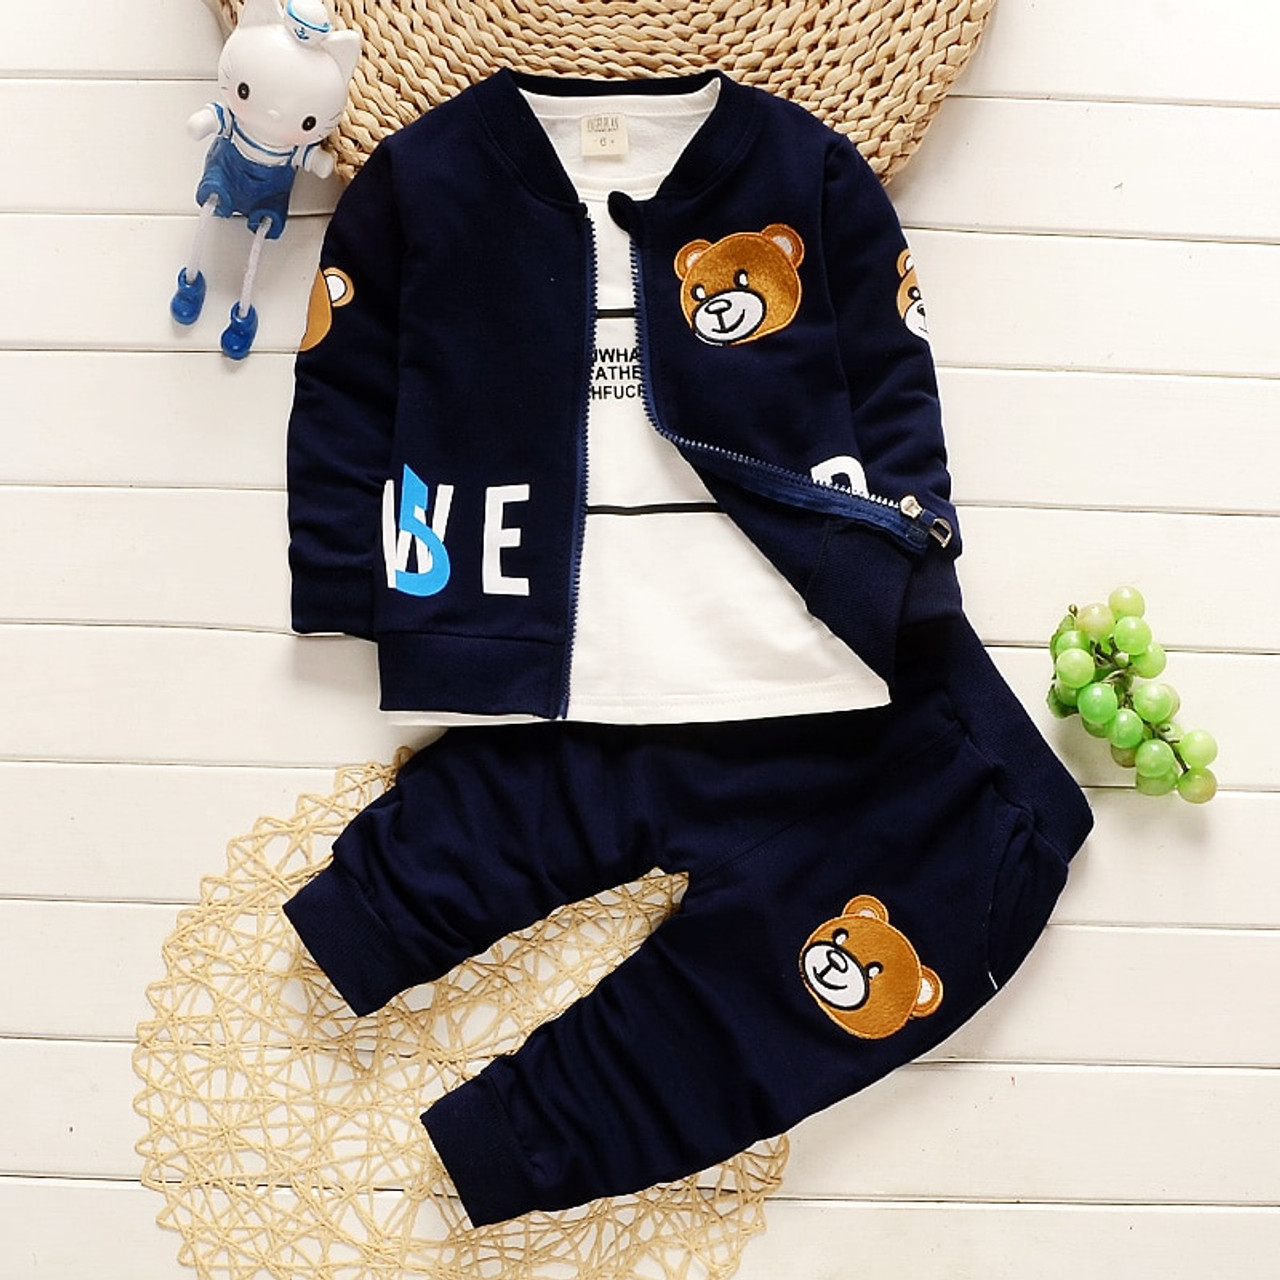 BibiCola baby boys clothing sets newborn boy coat + shirt +pants 3pcs set  cartoon bear suit infant boys clothes set - OnshopDeals.Com